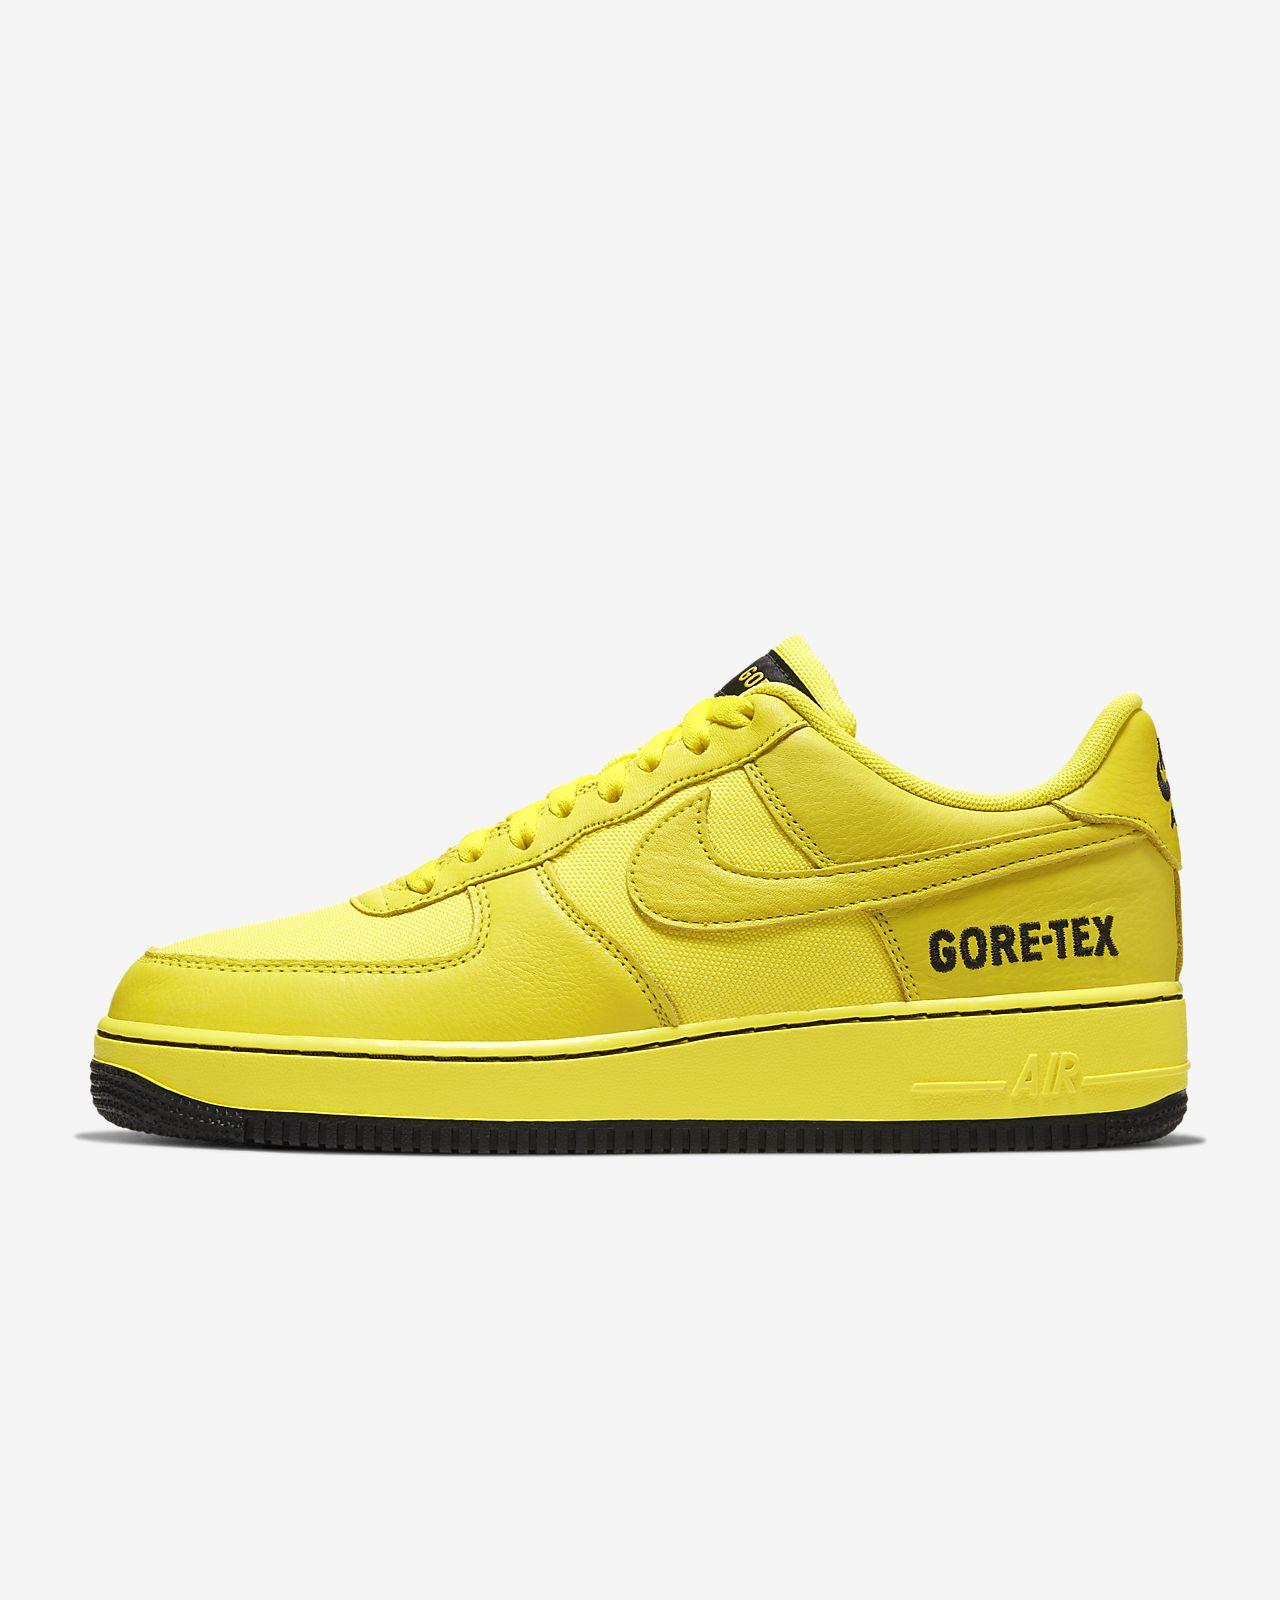 Nike X GORE TEX Air Force 1 Low